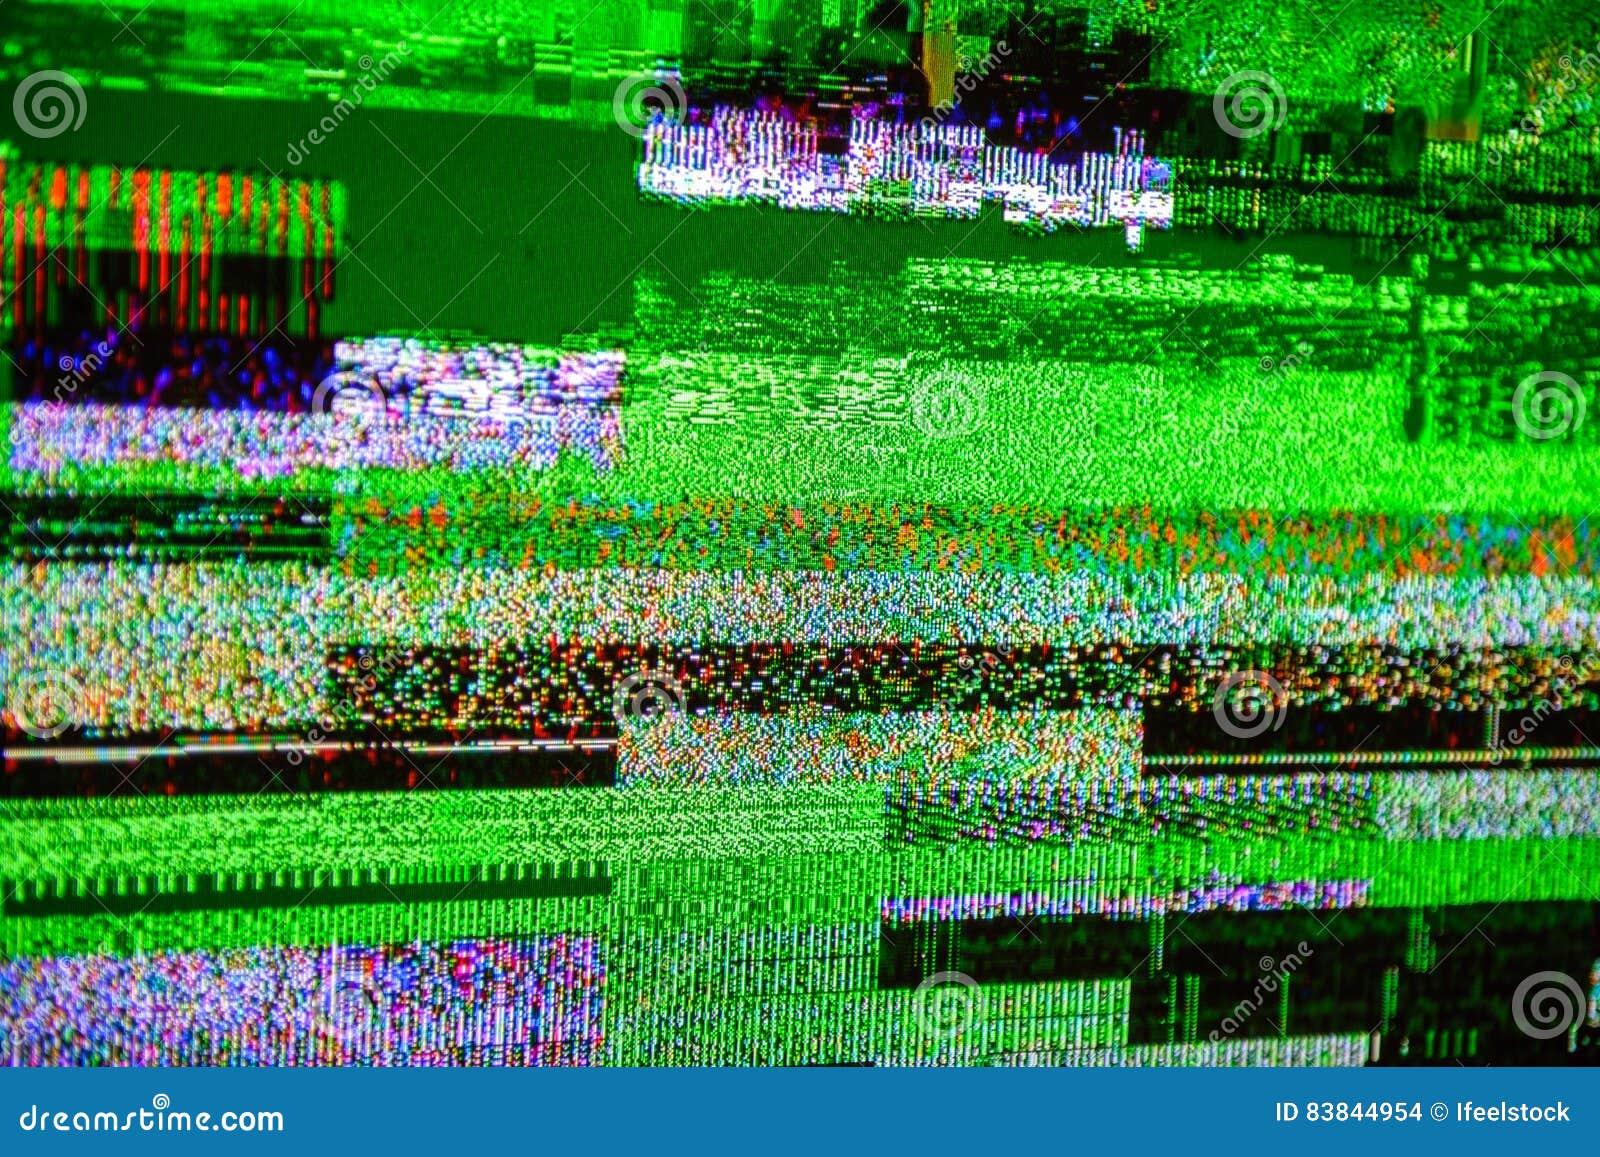 TV Noise Bad Signal Dbvt Signal Digital Video Broadcasting Stock